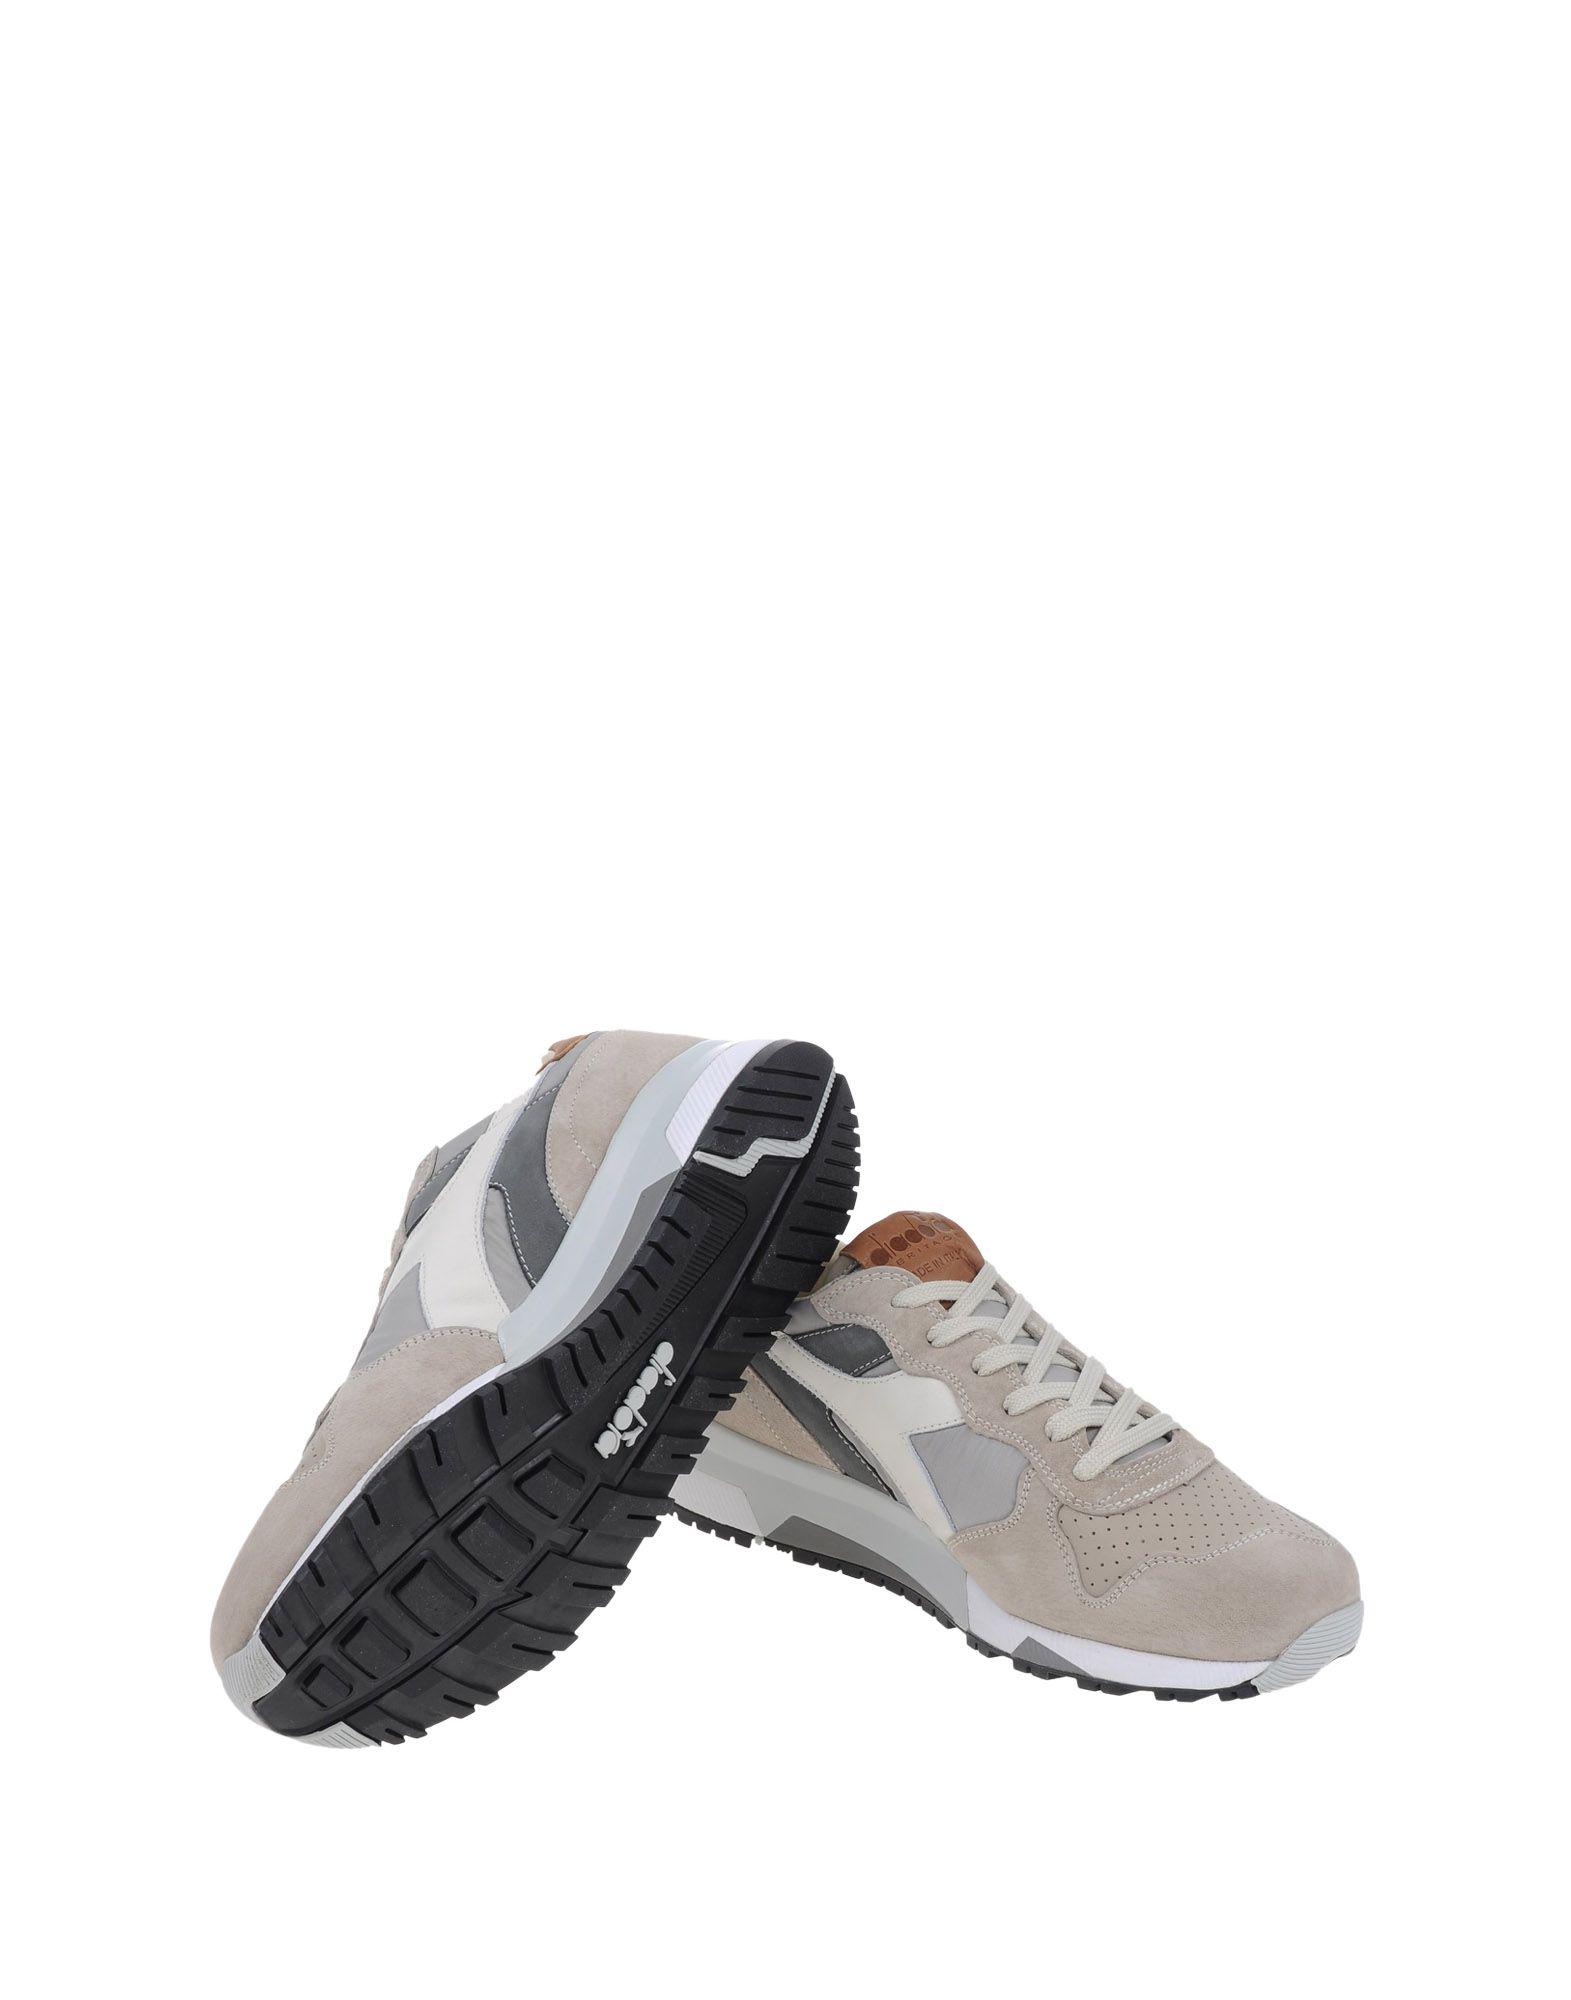 Diadora 44992291TI Heritage Trident 90 Nyl  44992291TI Diadora Gute Qualität beliebte Schuhe 286e92